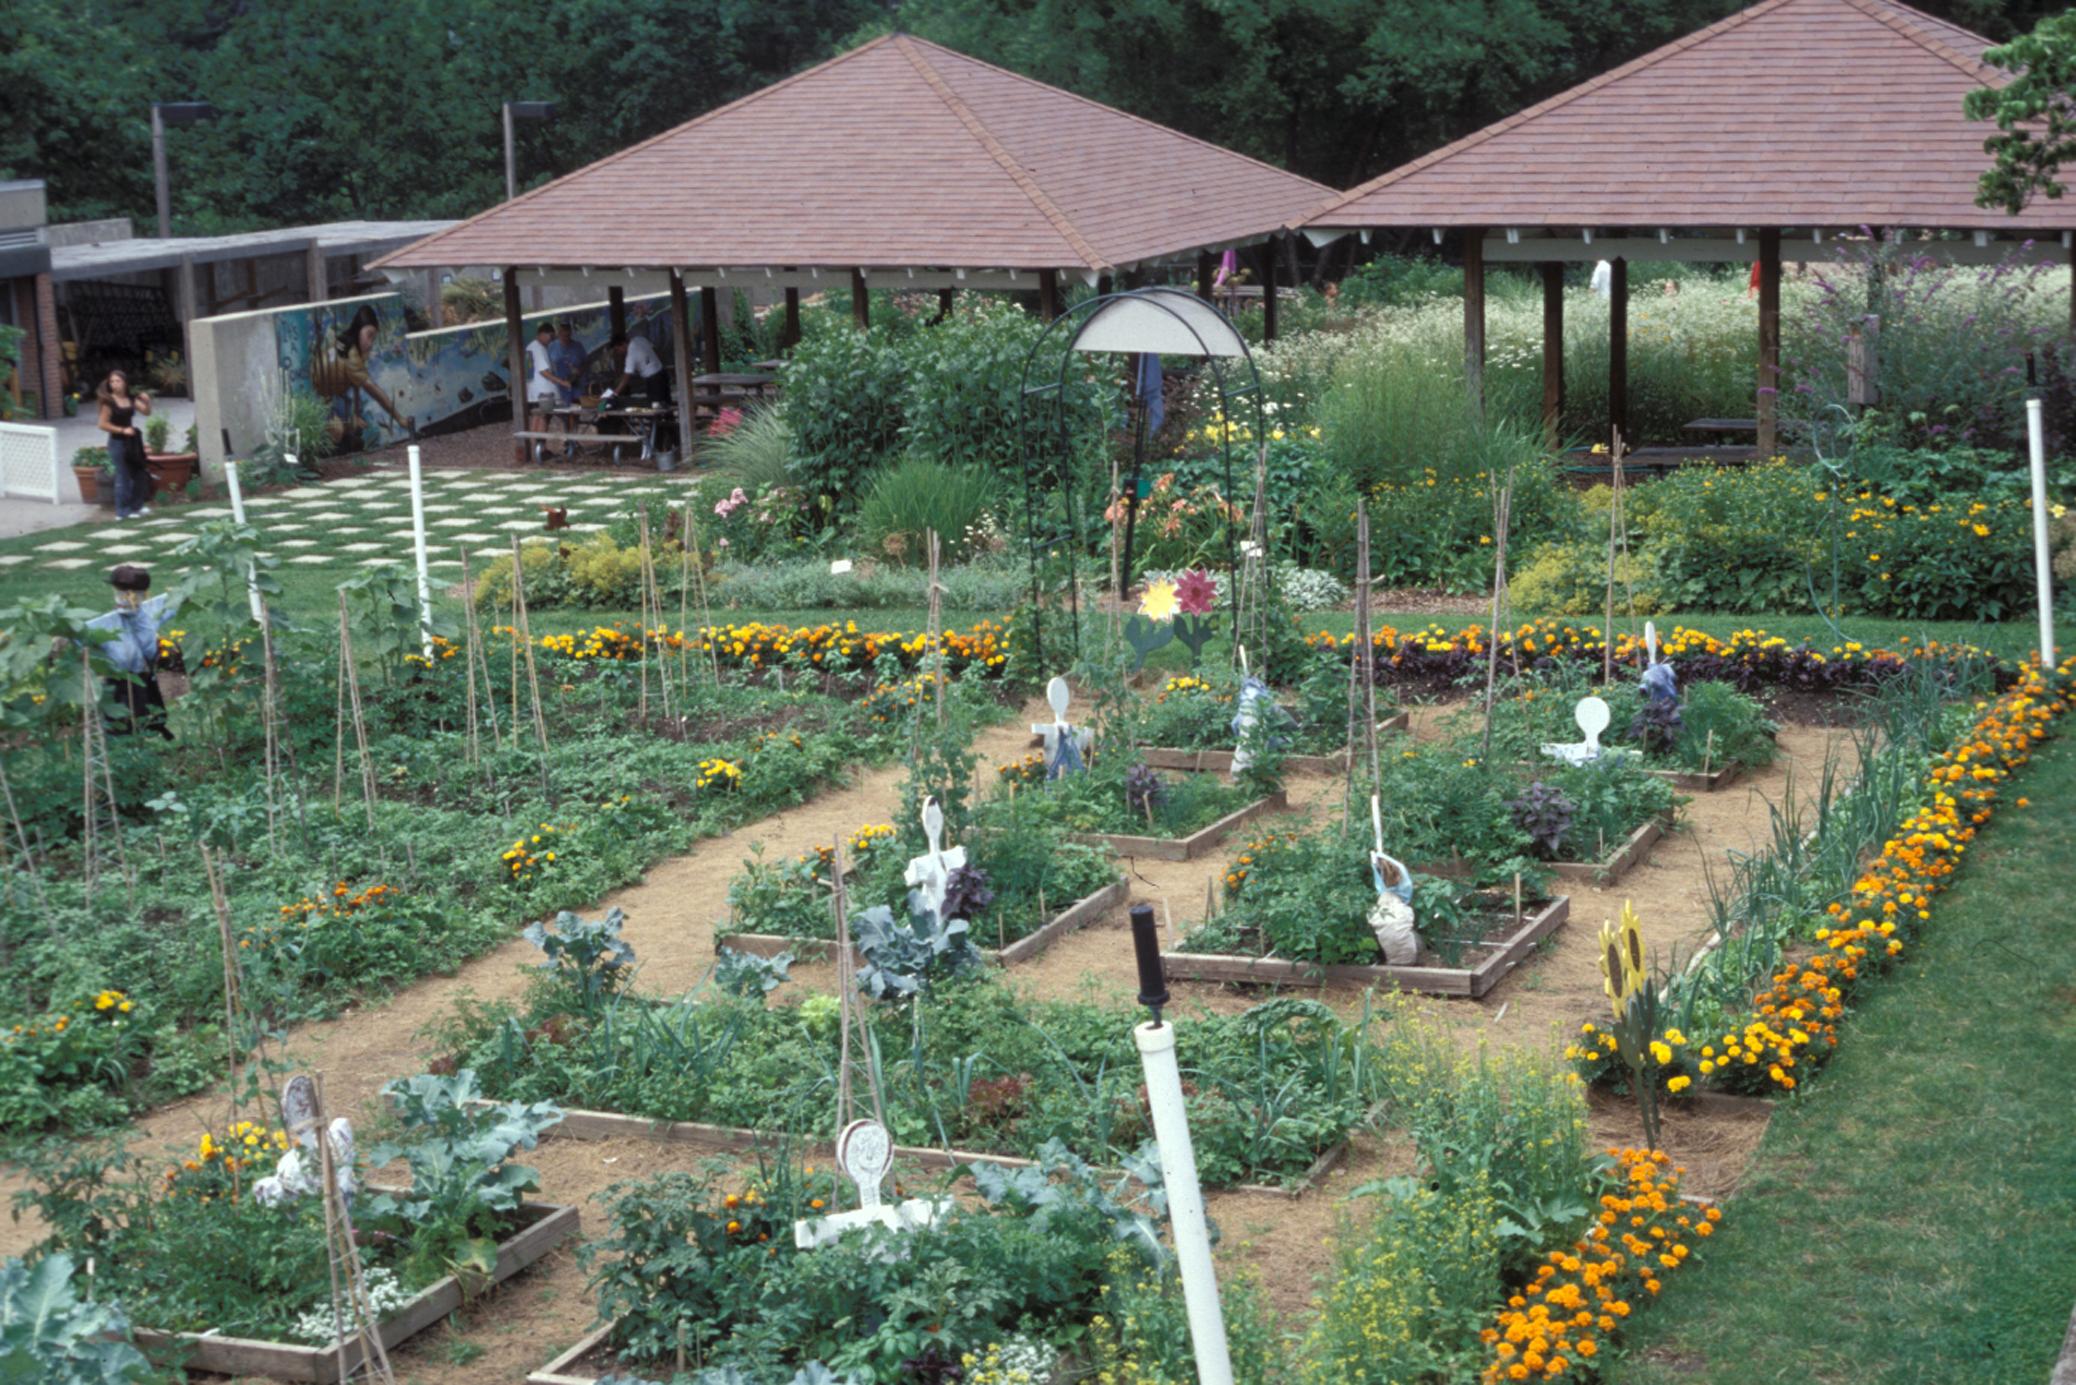 Pin Di Katie Sozansky Su School Garden Pinterest Giardini